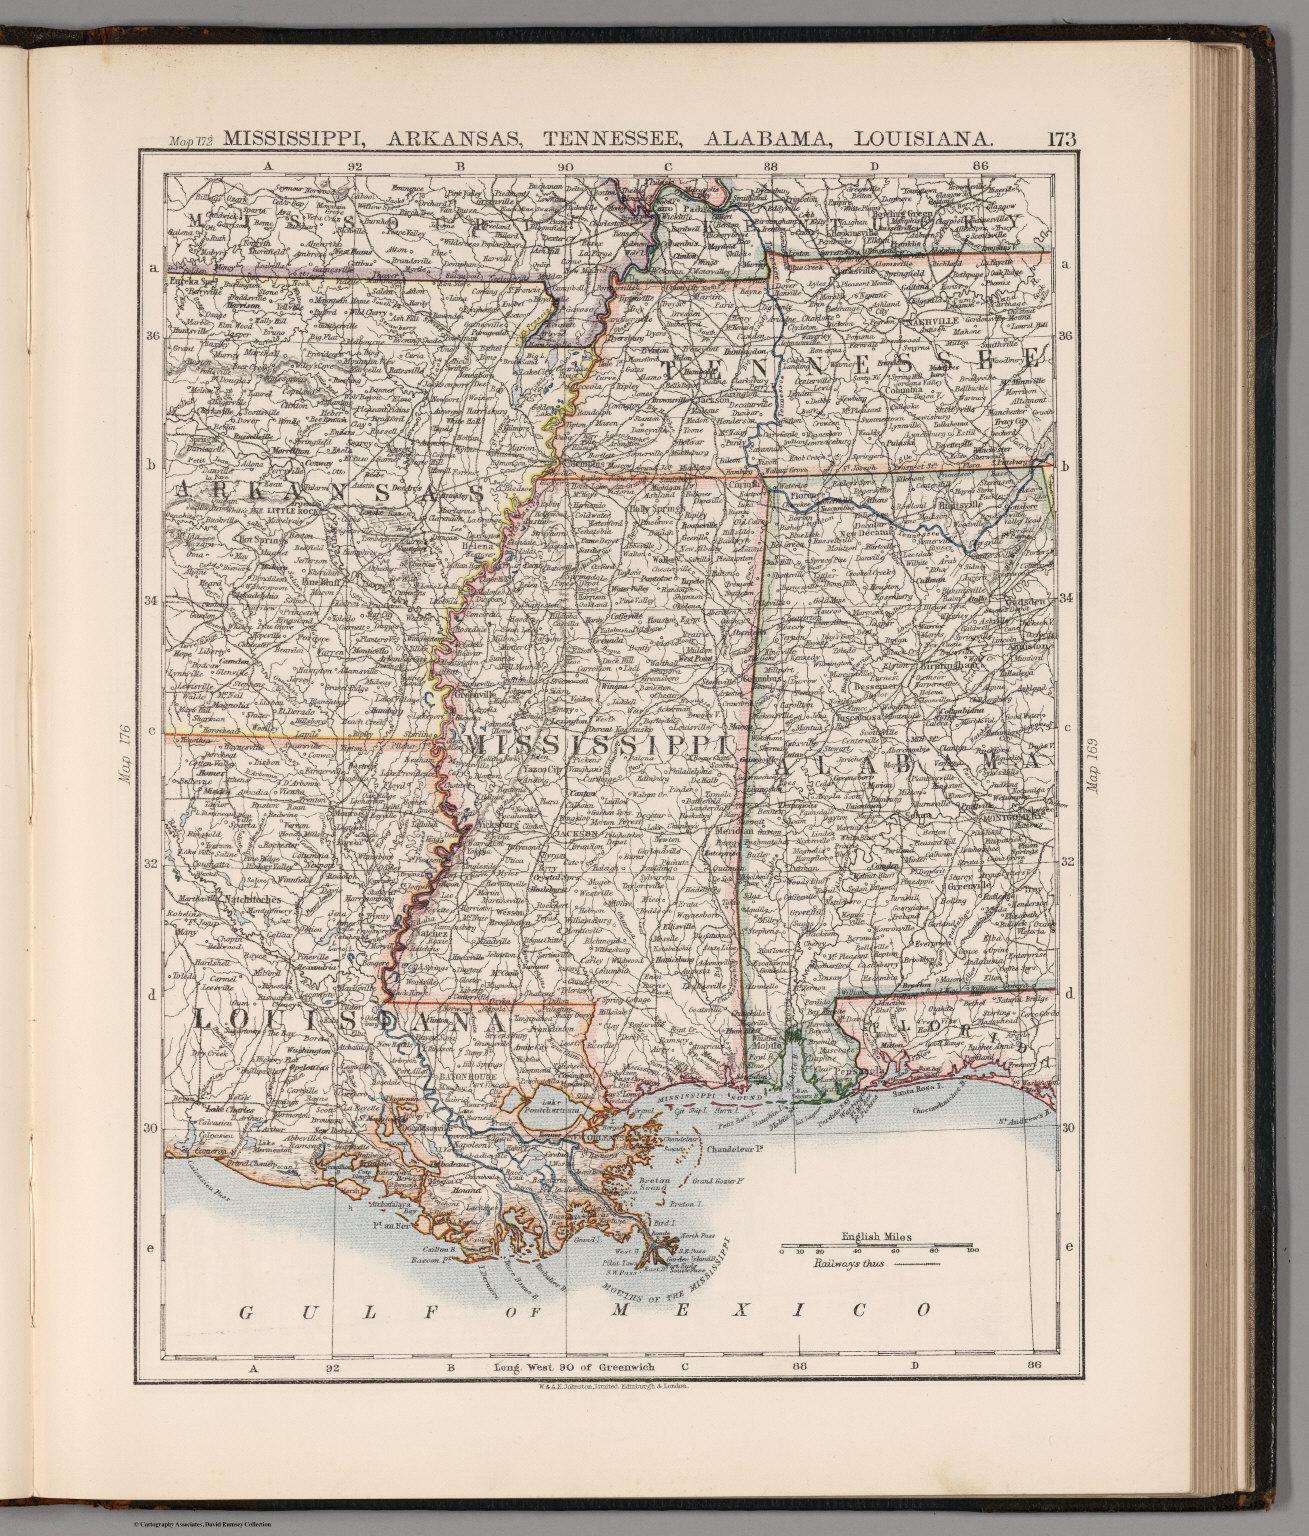 Arkansas And Louisiana Map.Mississippi Arkansas Tennessee Alabama Louisiana David Rumsey